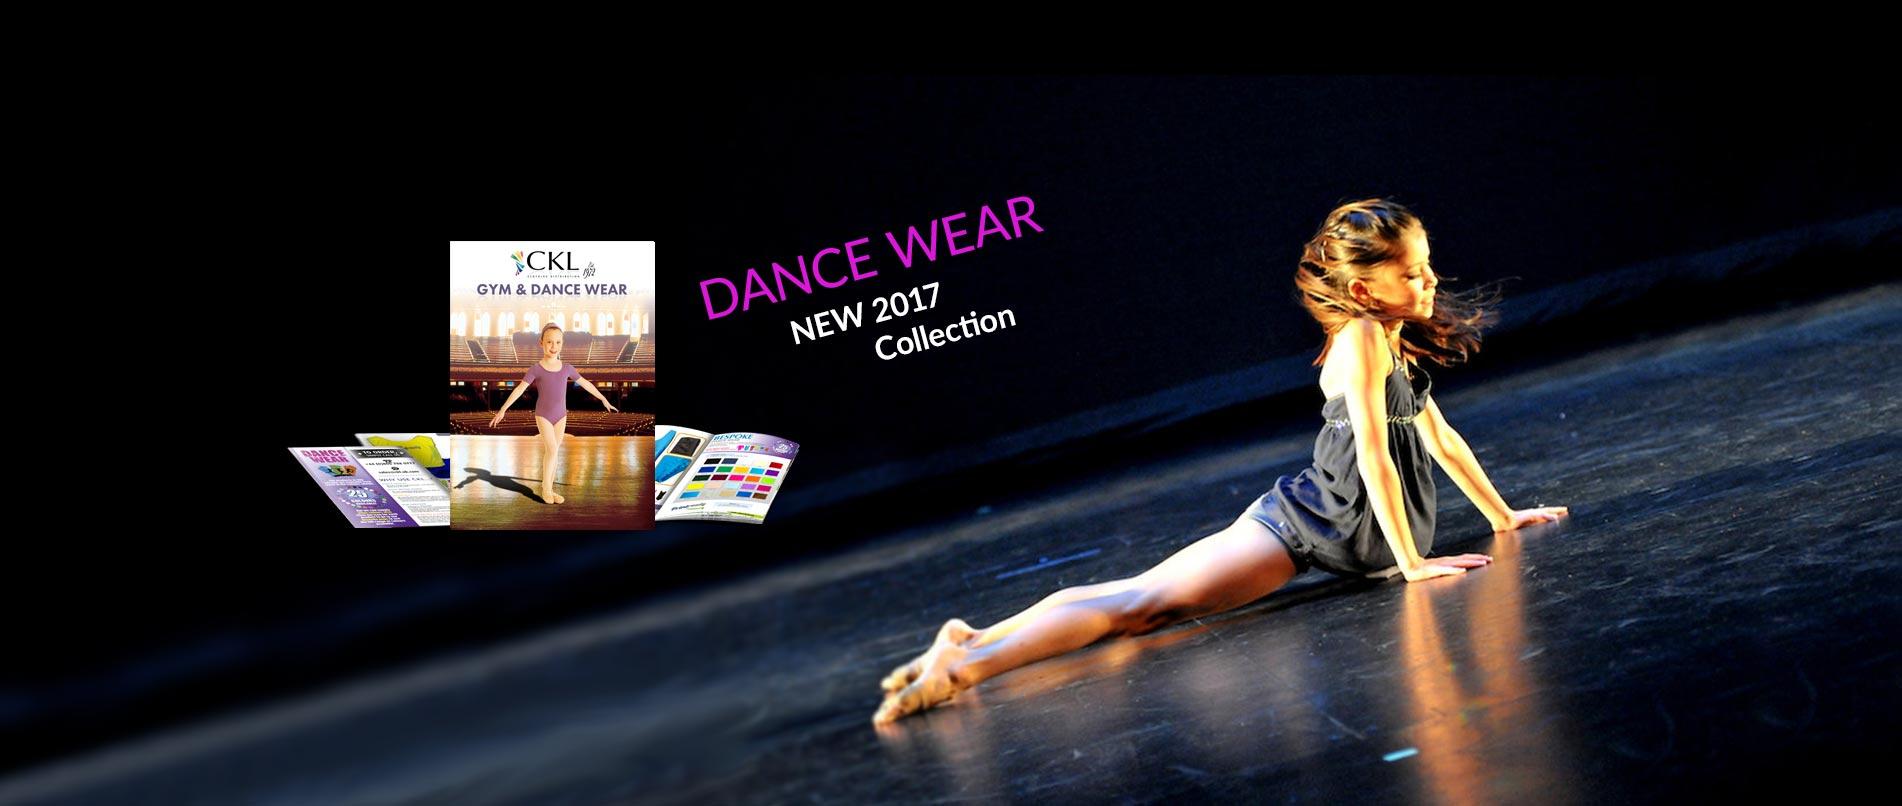 CKL Dancewear - The Best Prices in the UK